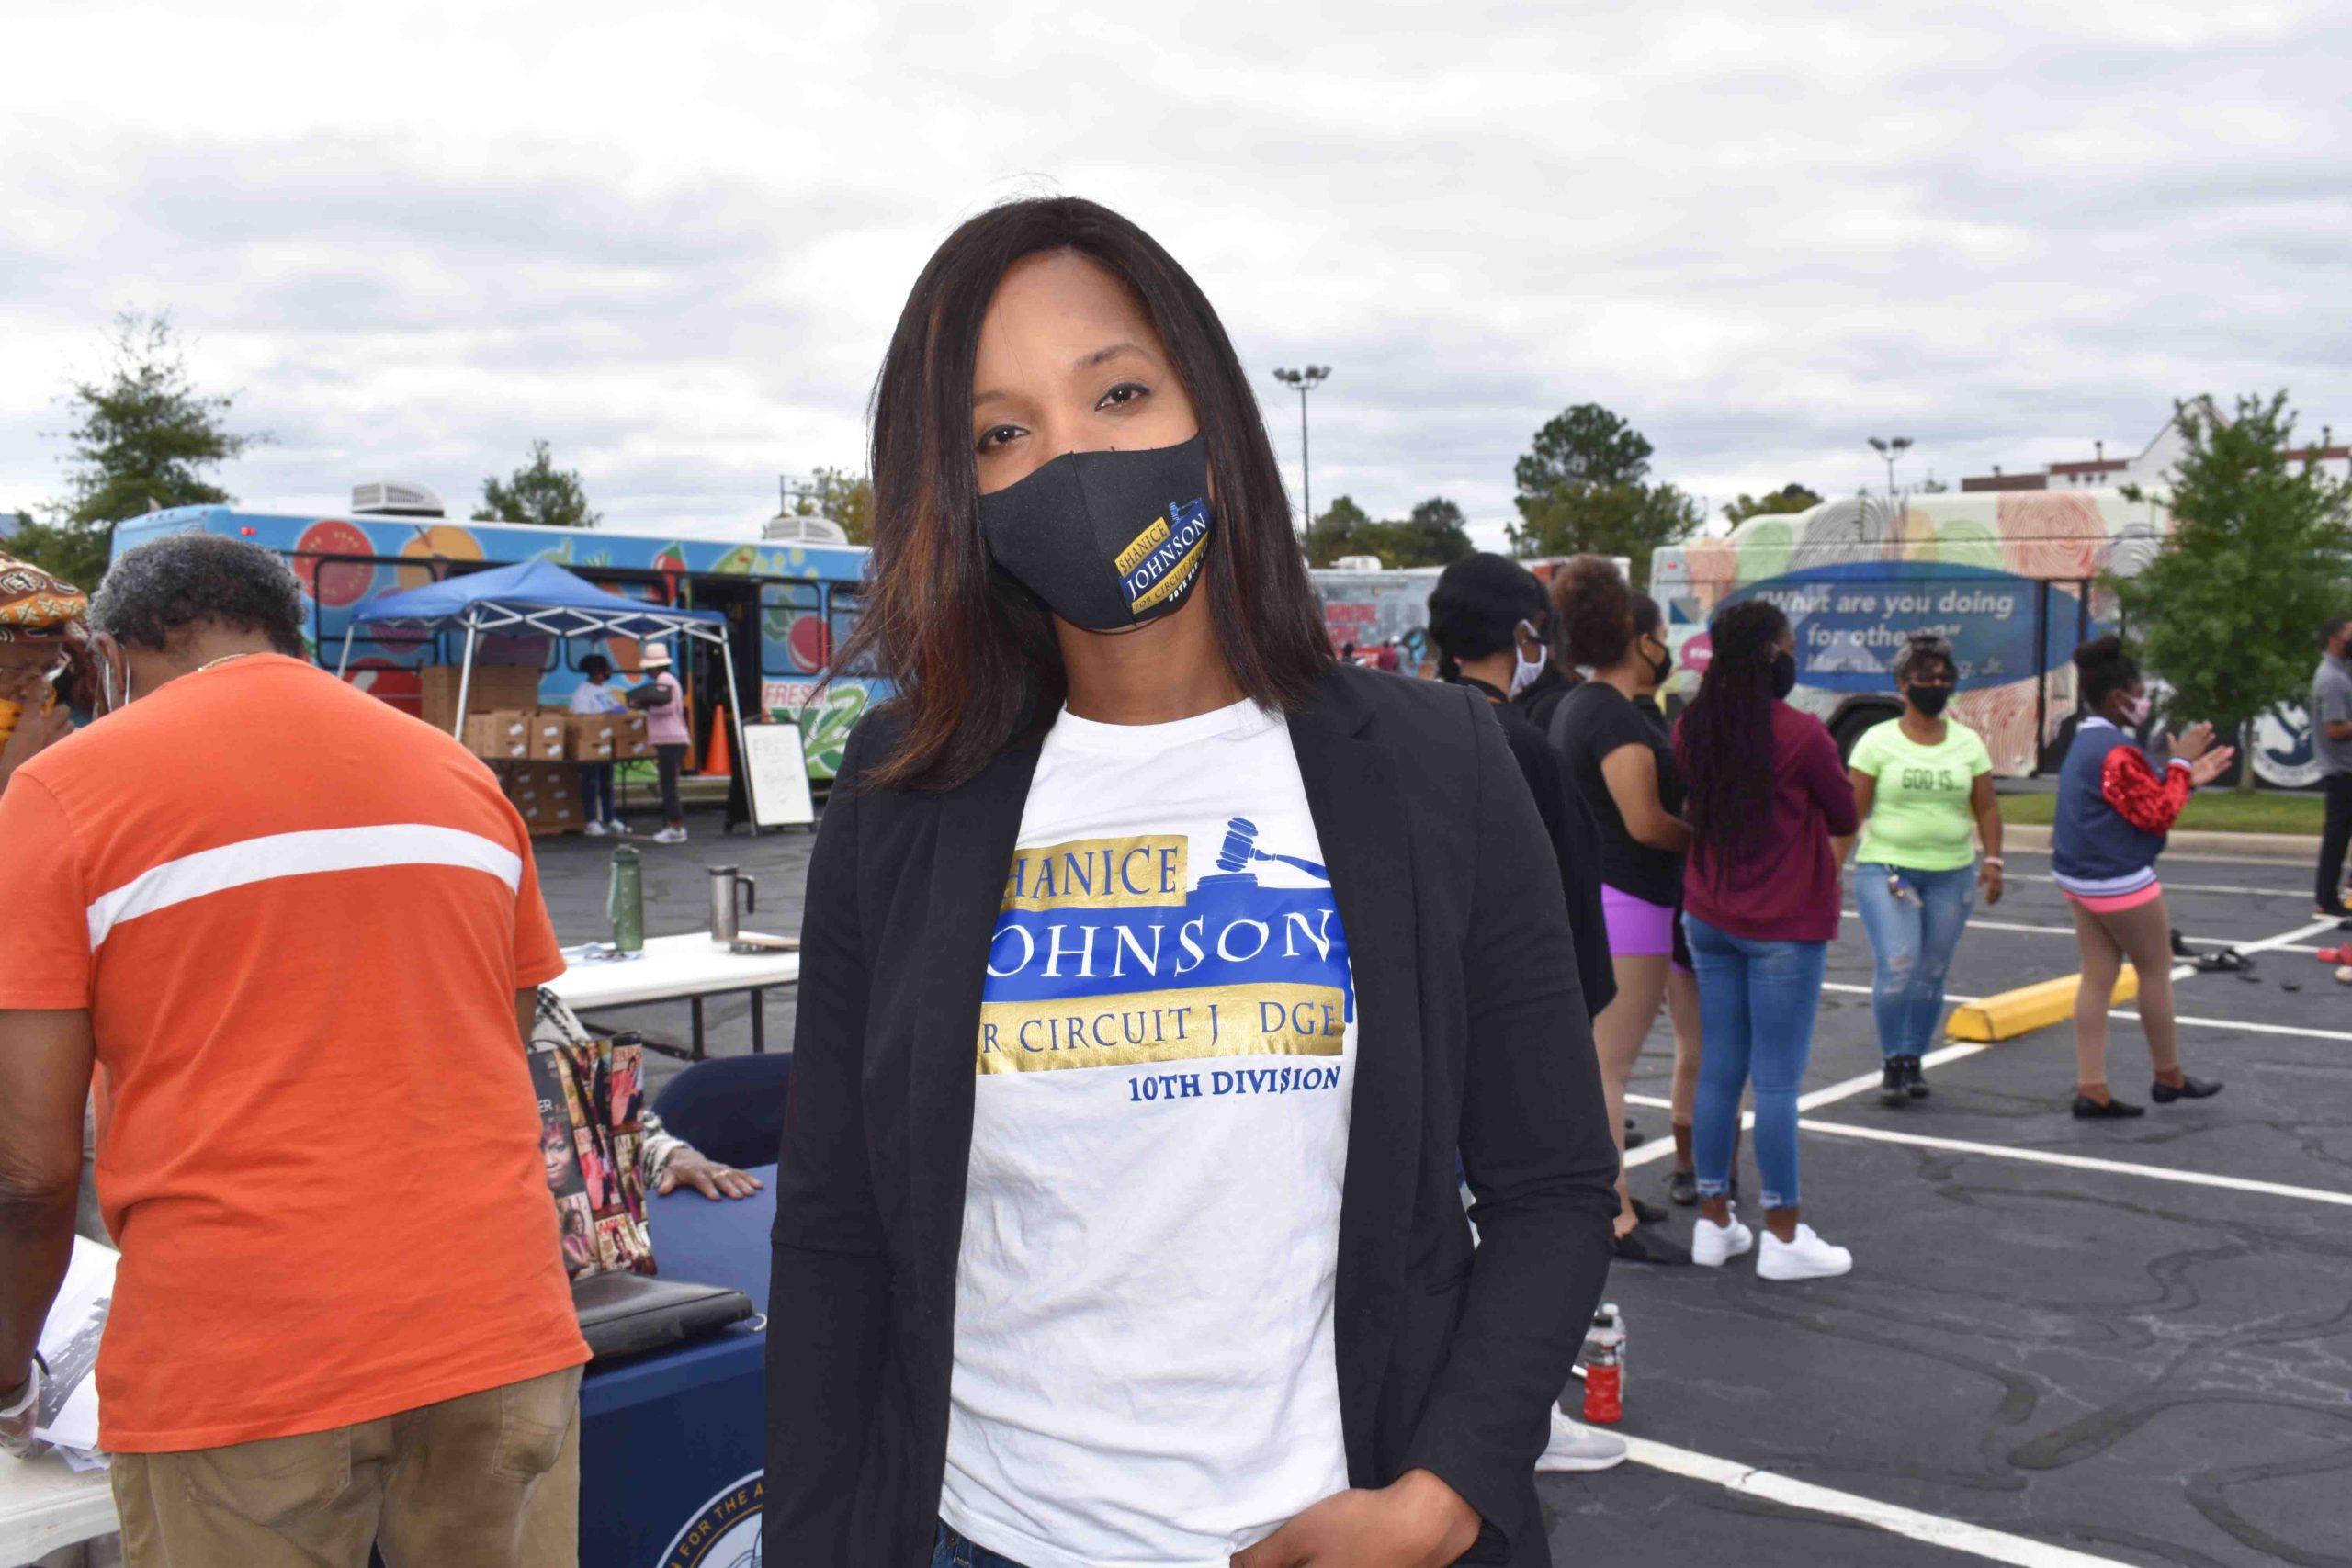 Shanice Johnson